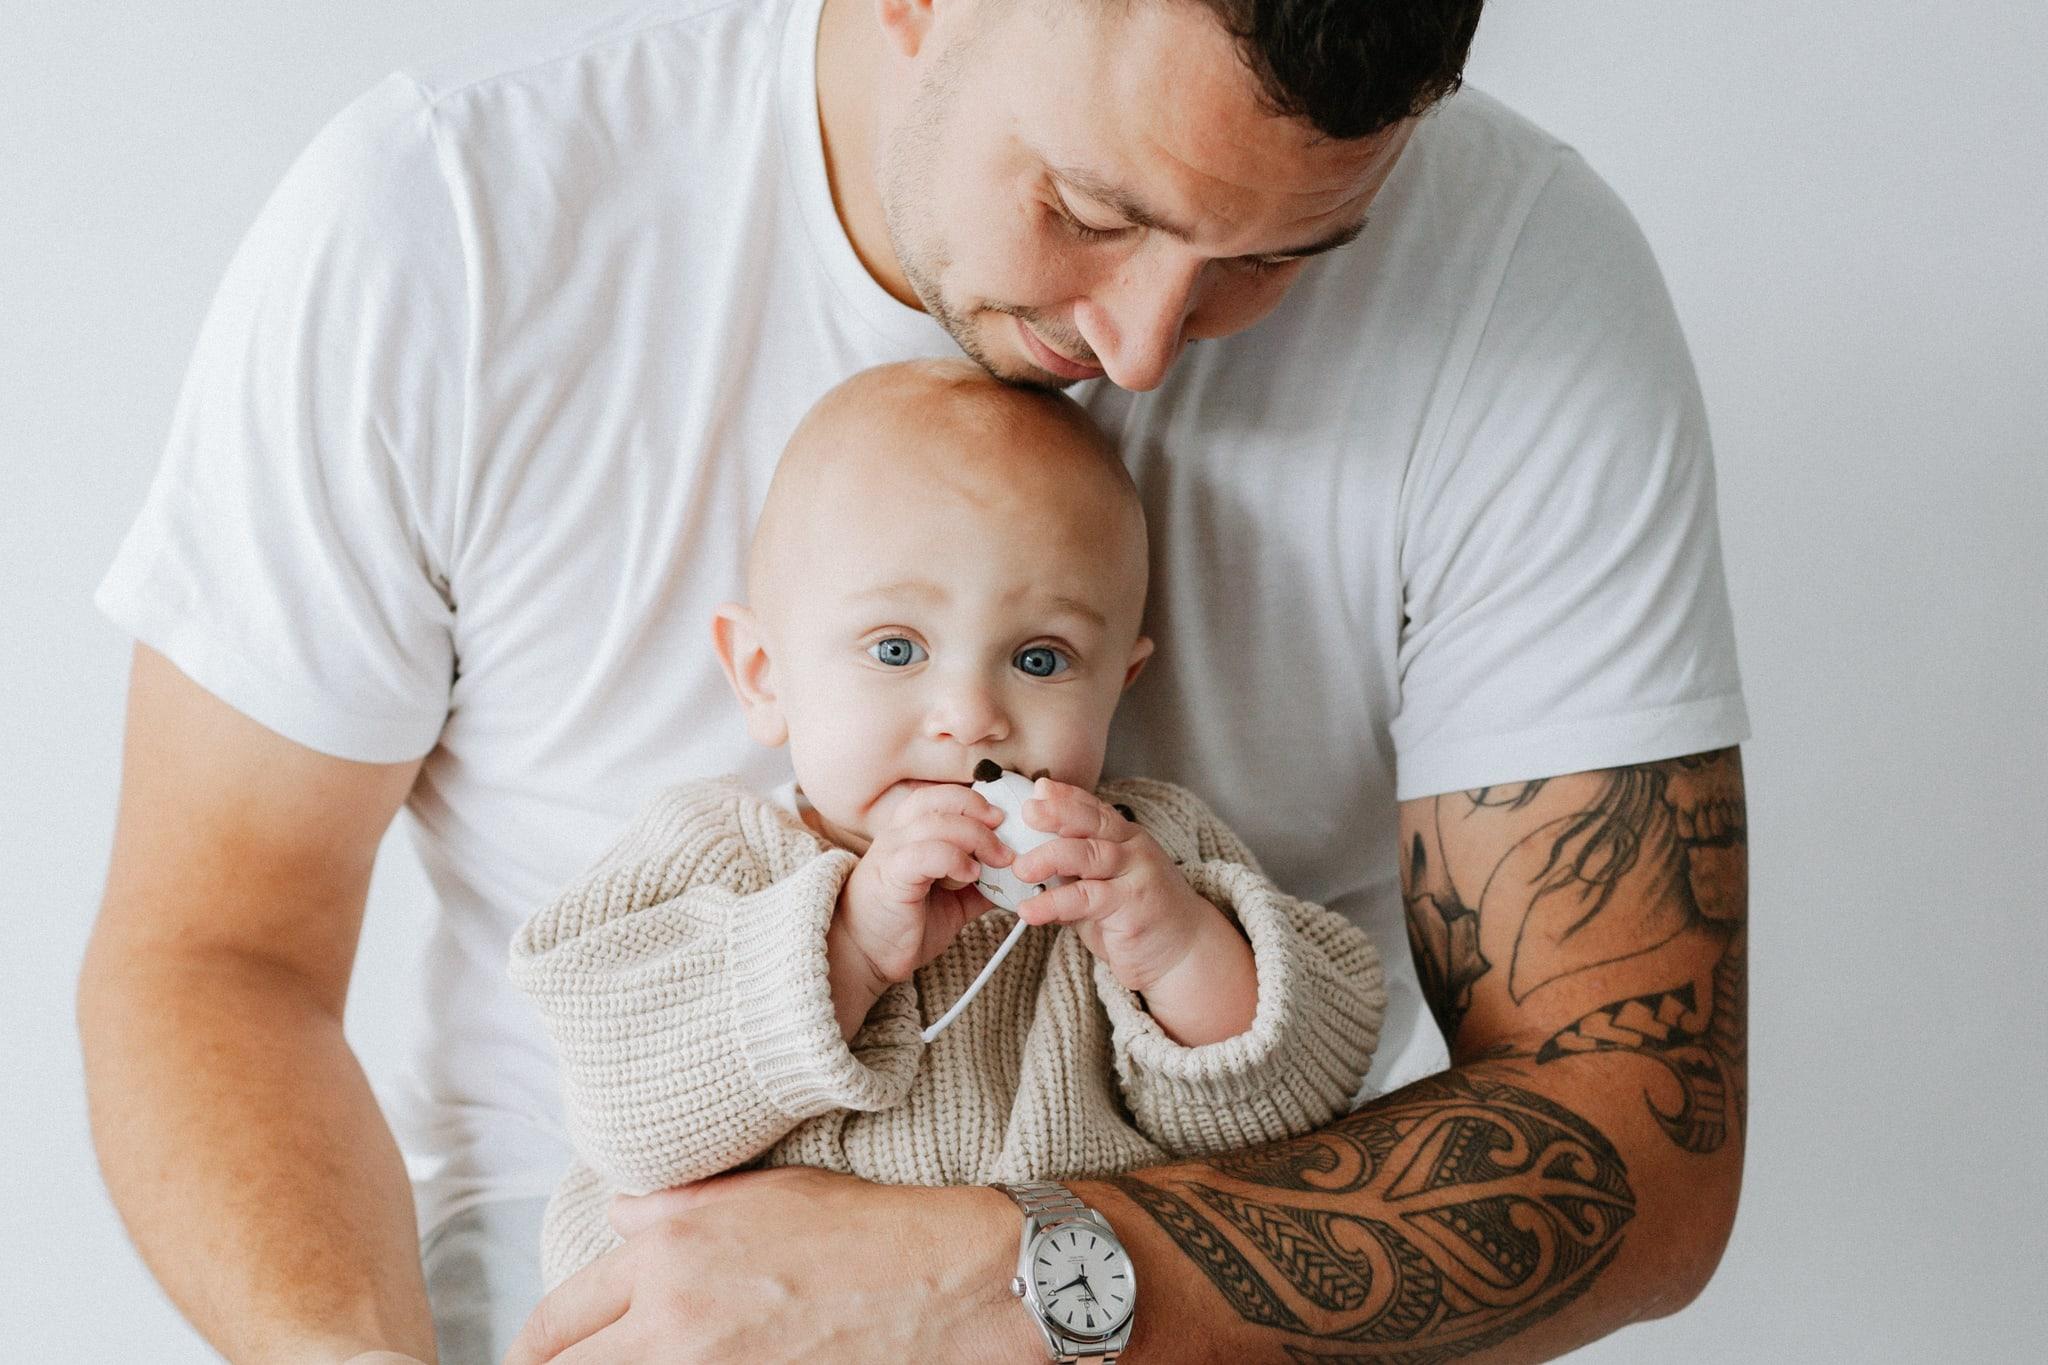 Bexley Baby Photography Studio – baby sessions